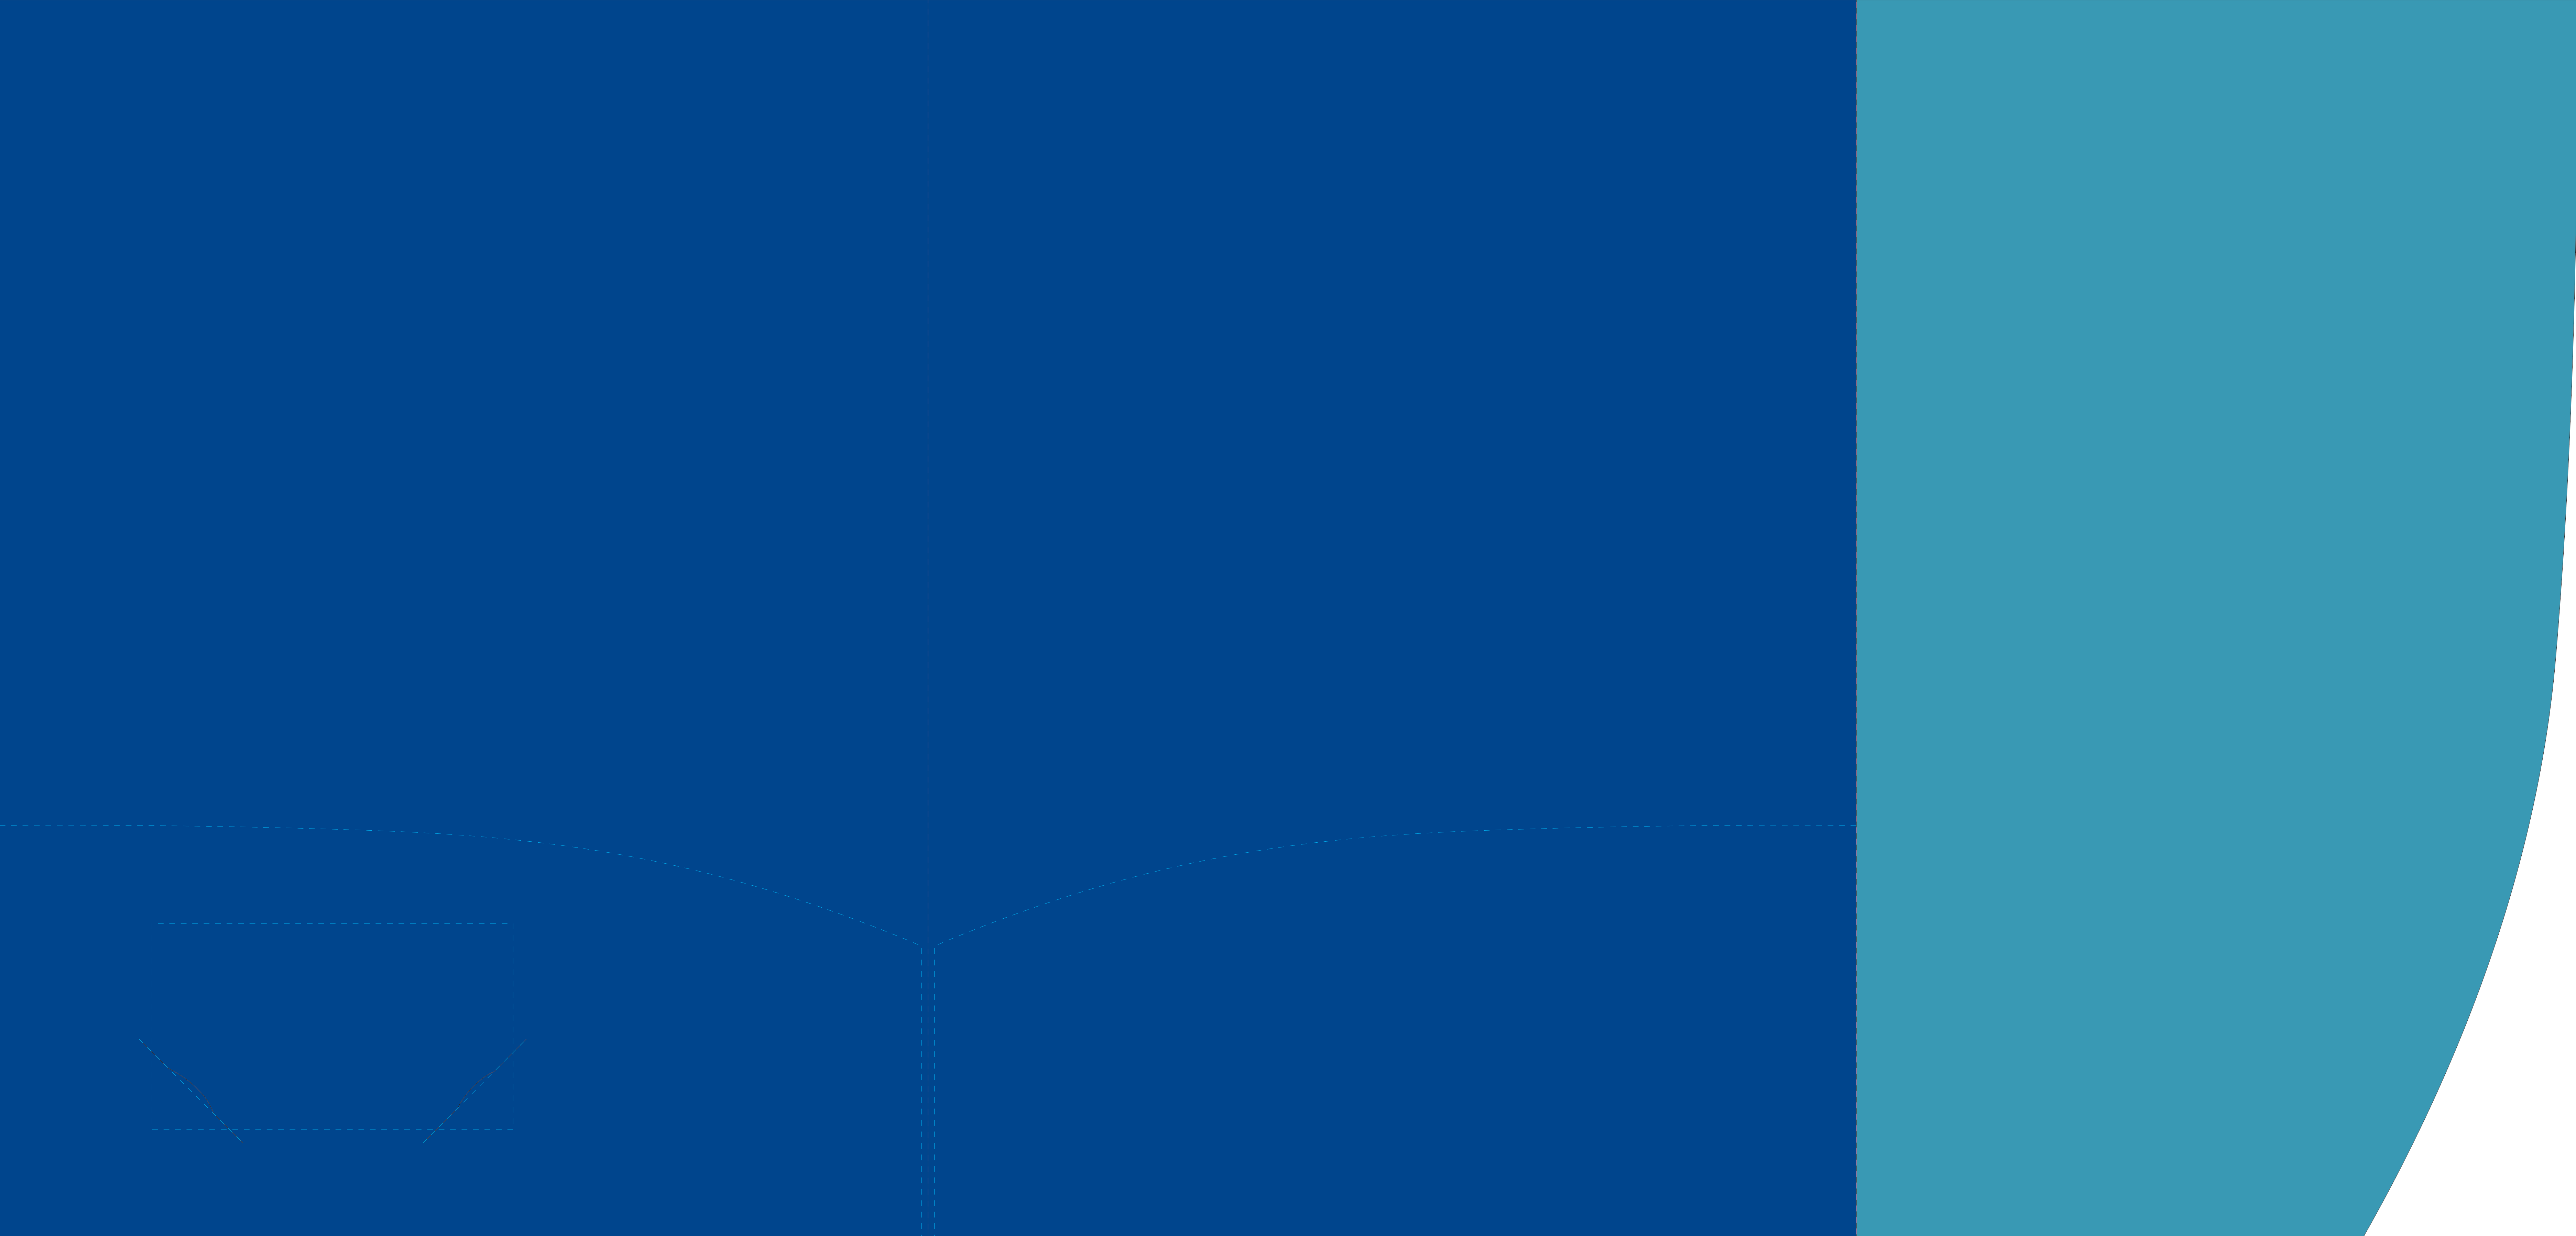 Florence-Crittenton-Interior-Folder-Lori-Pasulka